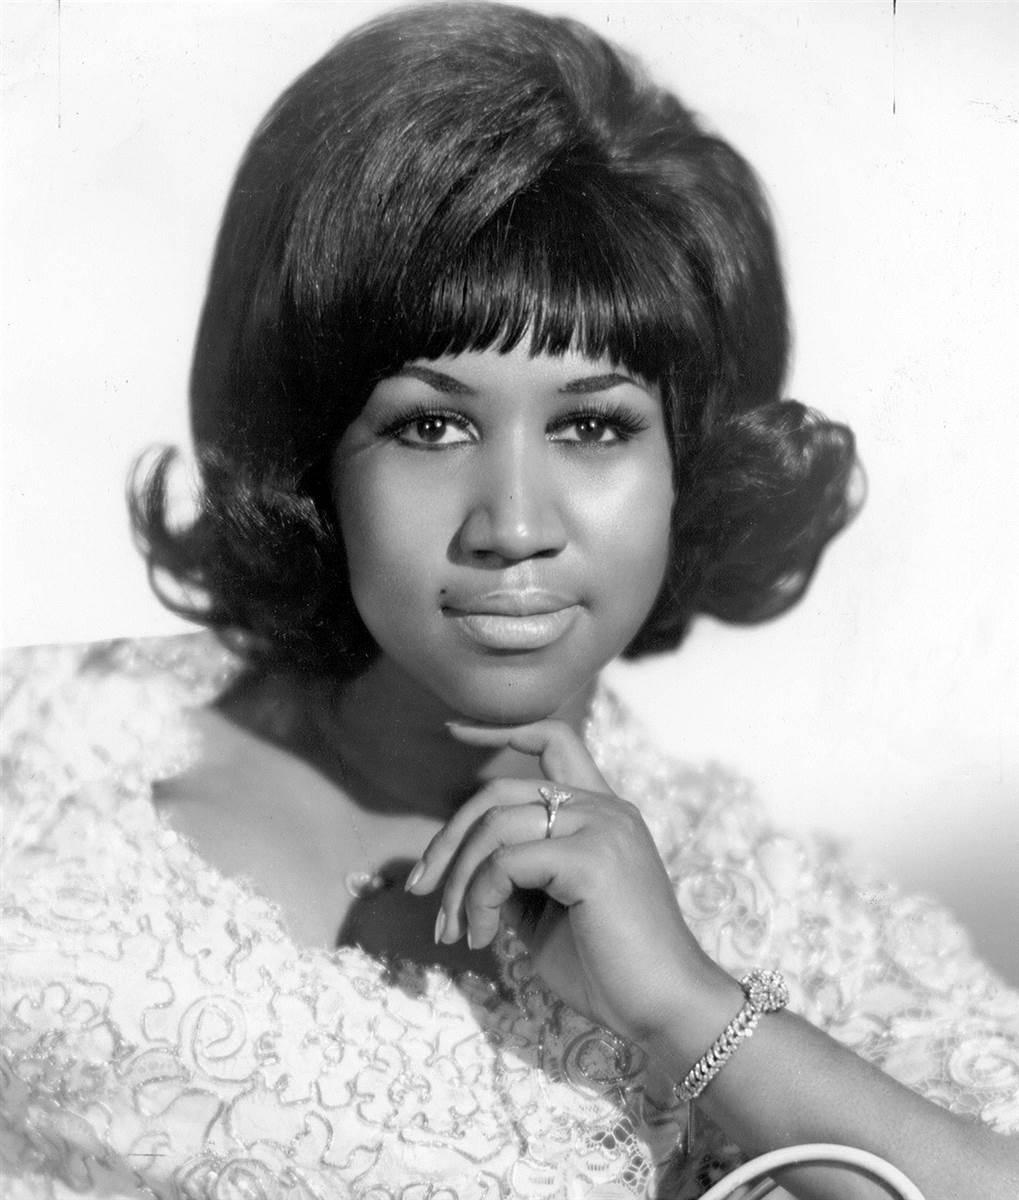 ss-101105-Aretha-Franklin-1960-portrait.today-ss-slide-desktop